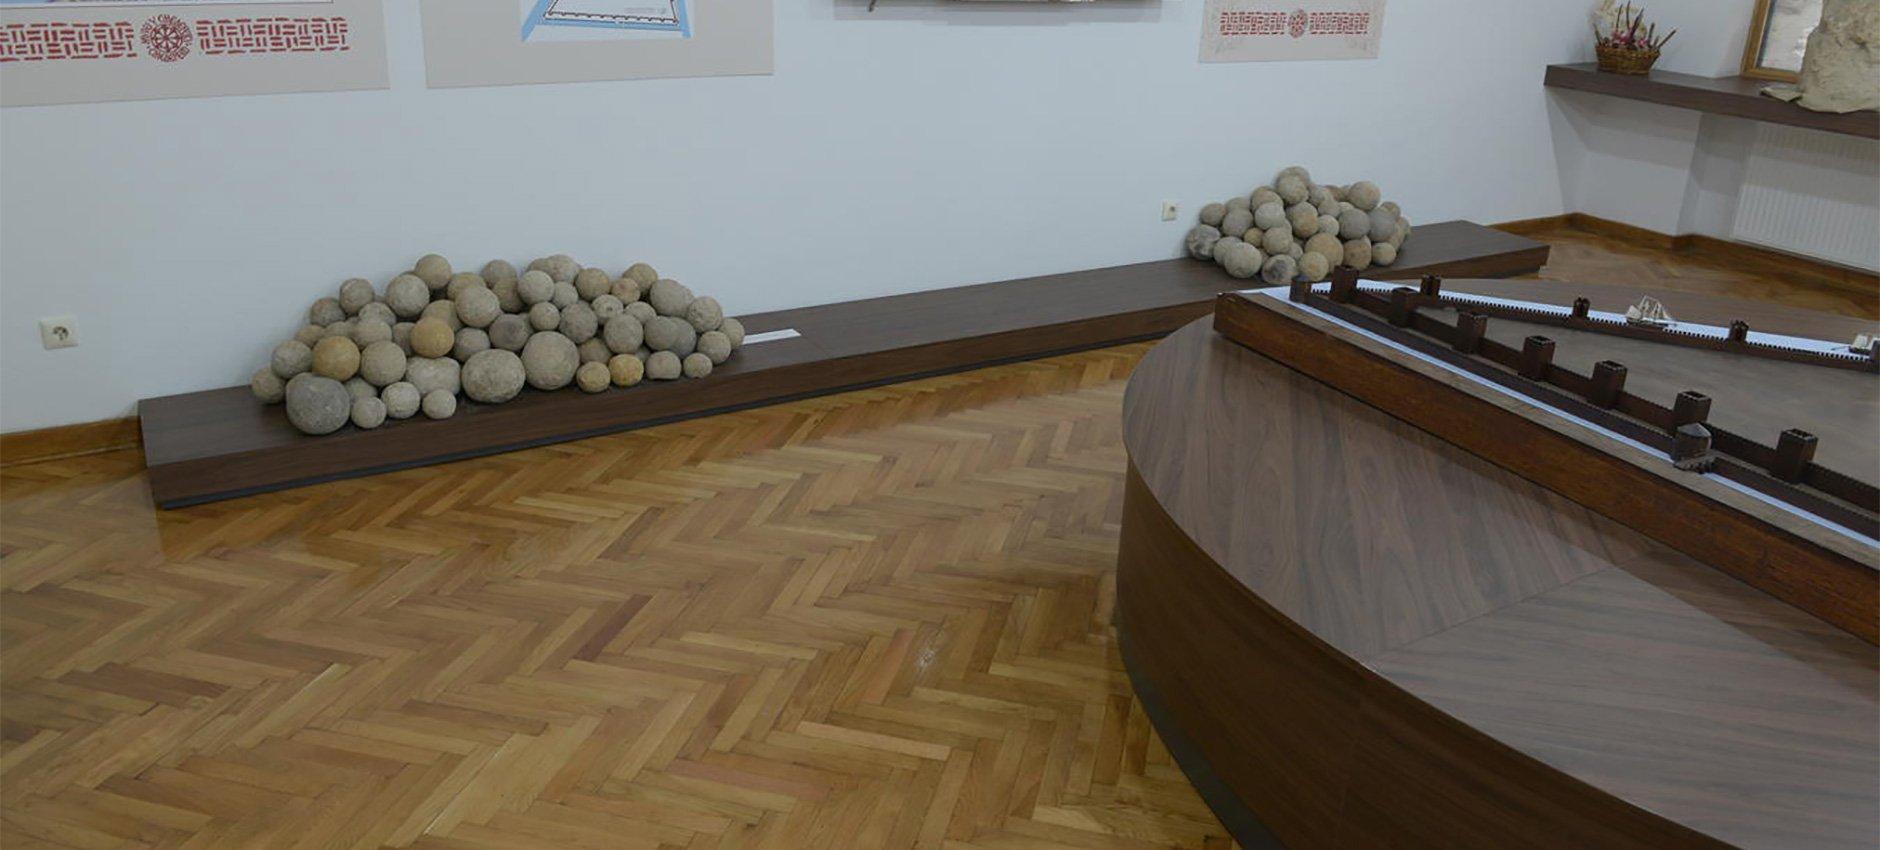 smederevo-muzej-9.jpg